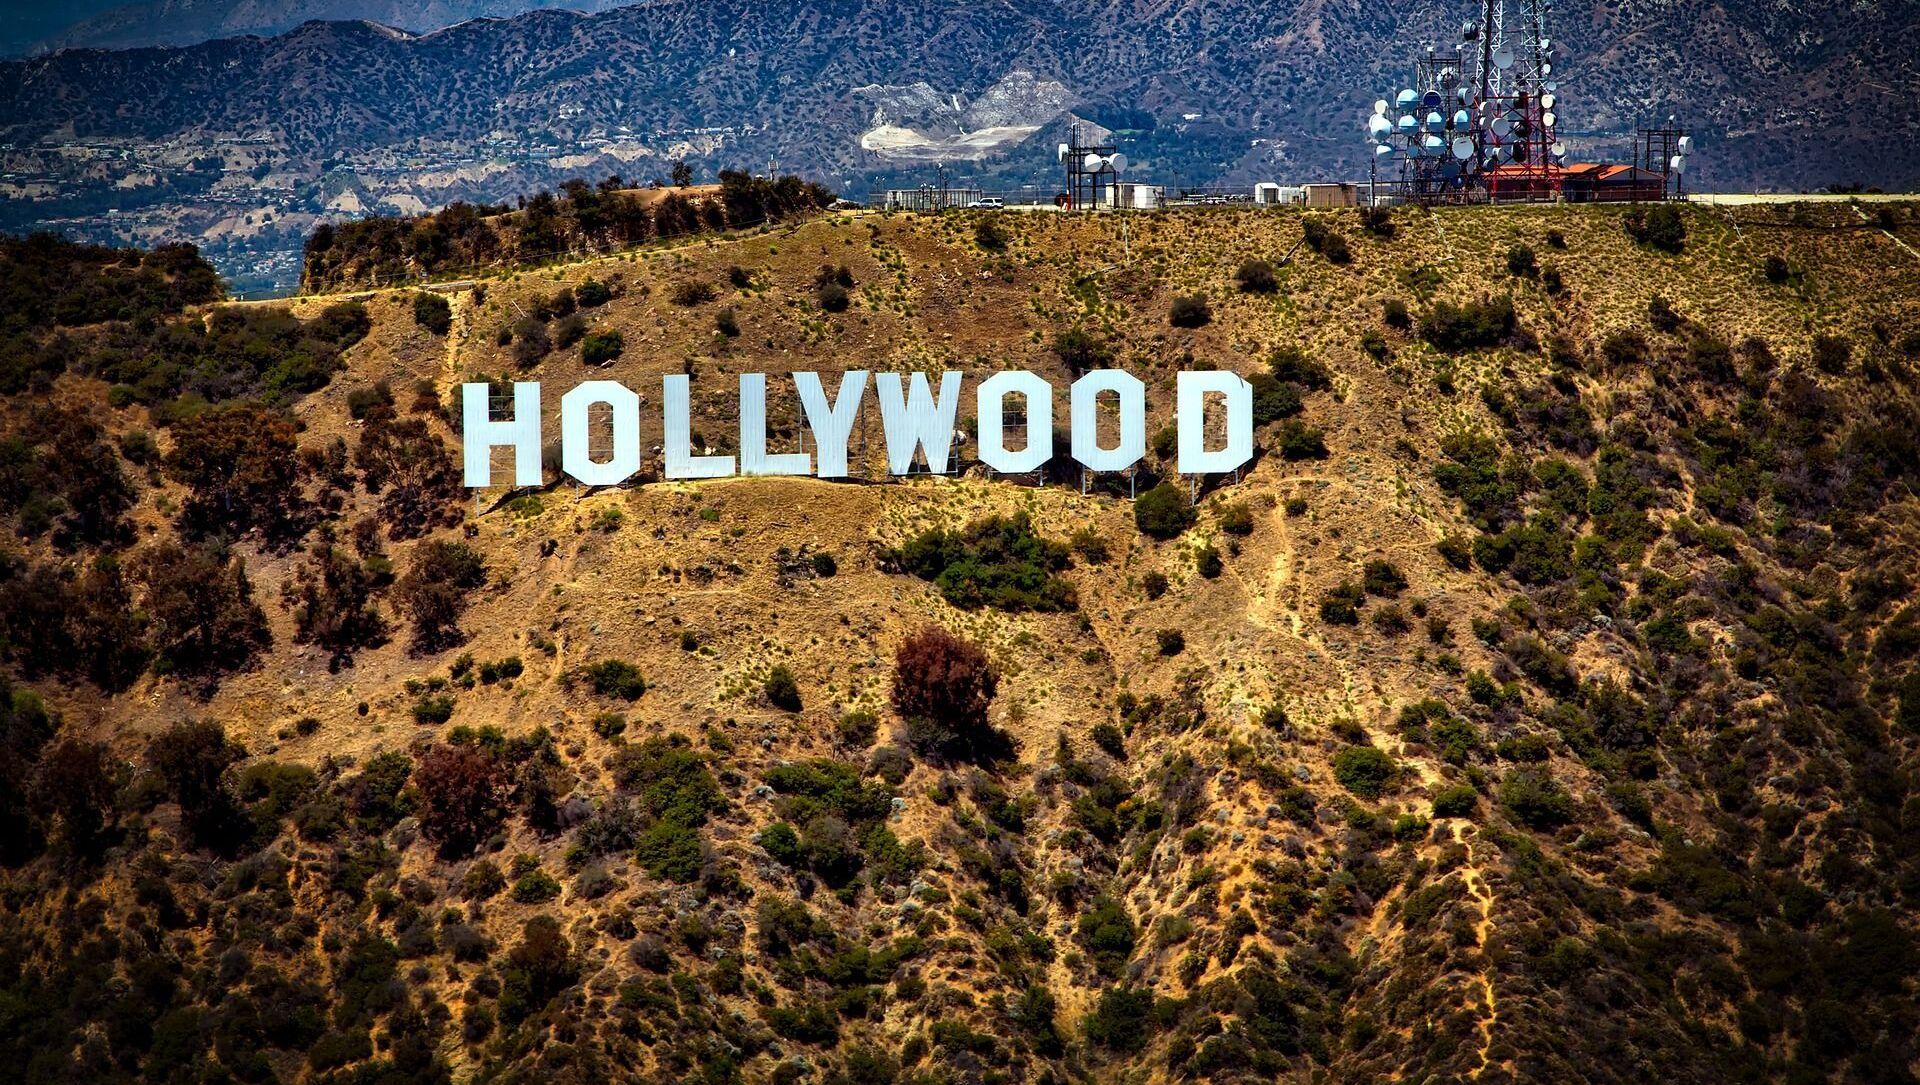 Вид на холм, где установлен знак Hollywood в США - Sputnik Грузия, 1920, 09.06.2021